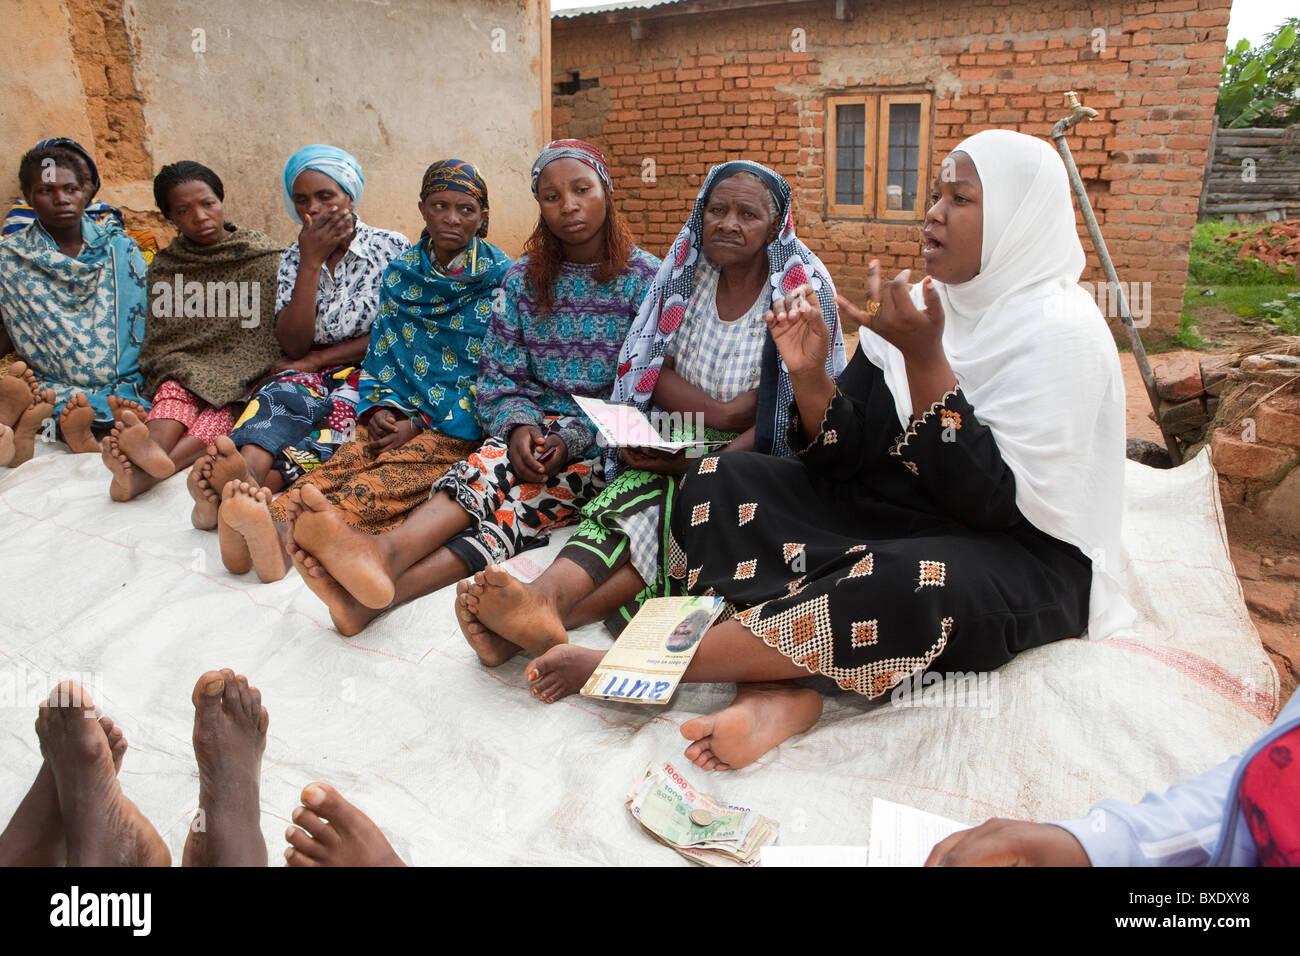 Women attend a community meeting in Iringa, Tanzania, East Africa. - Stock Image